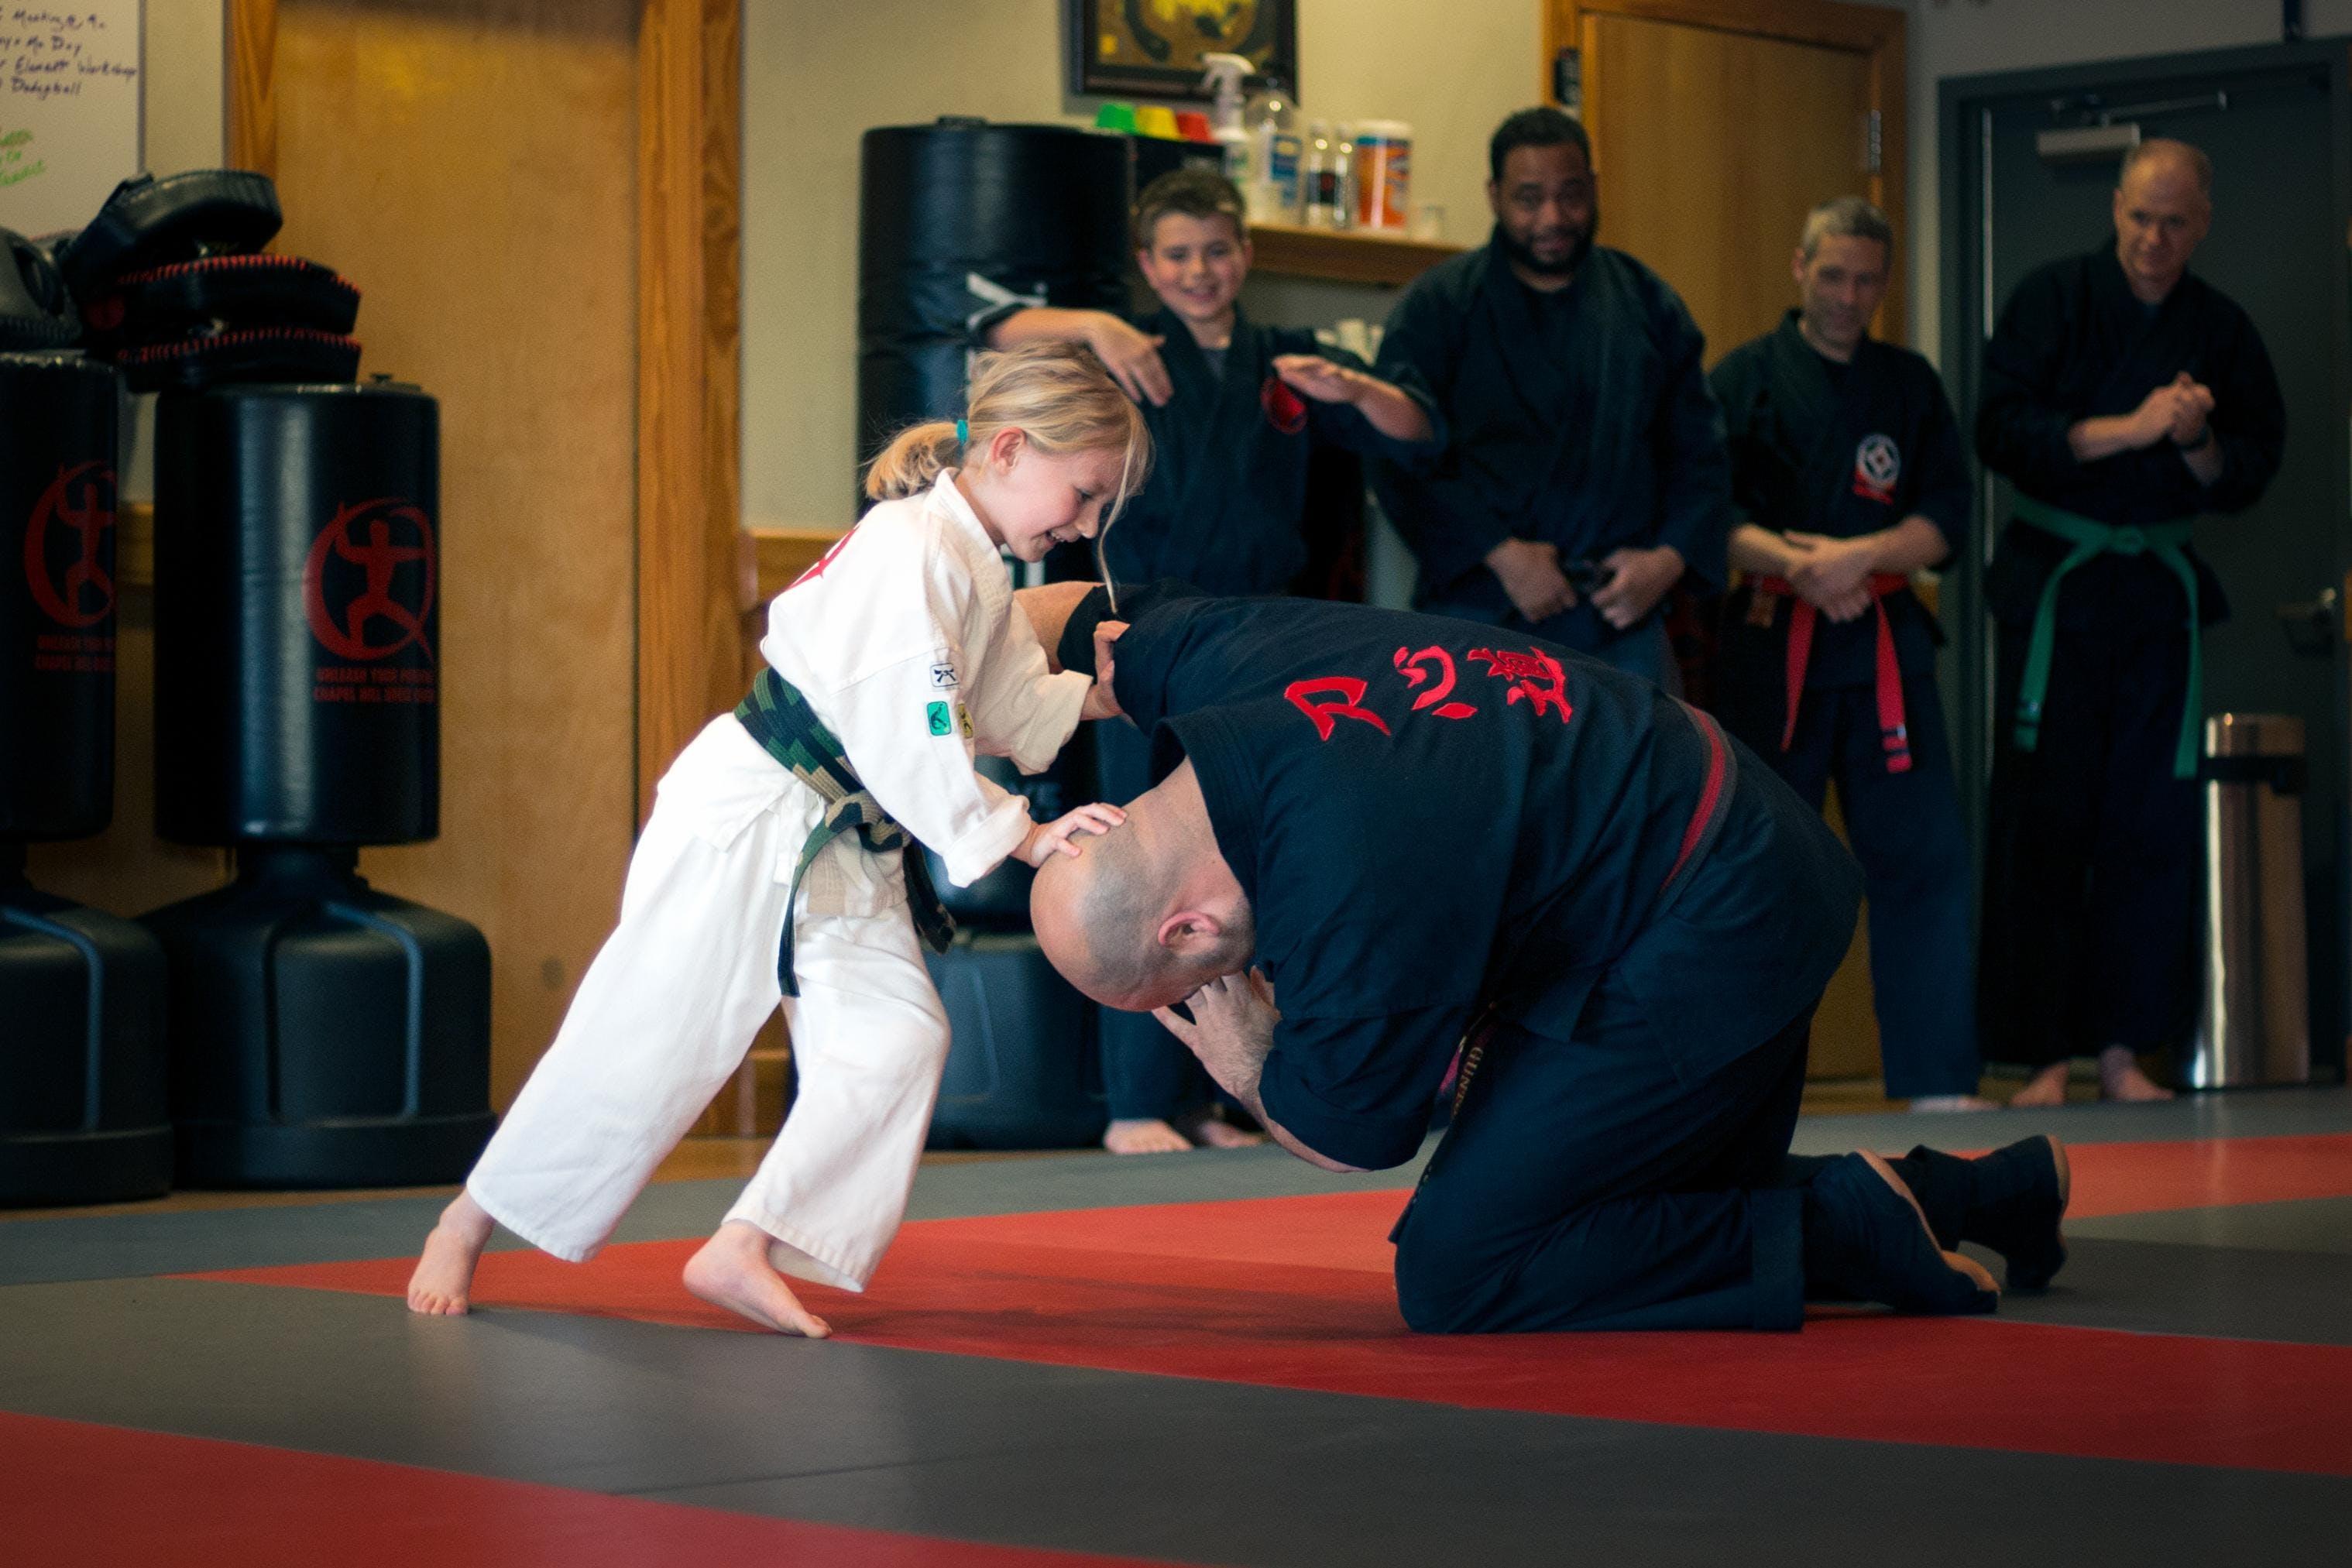 Afterschool Martial Arts at St. Thomas More